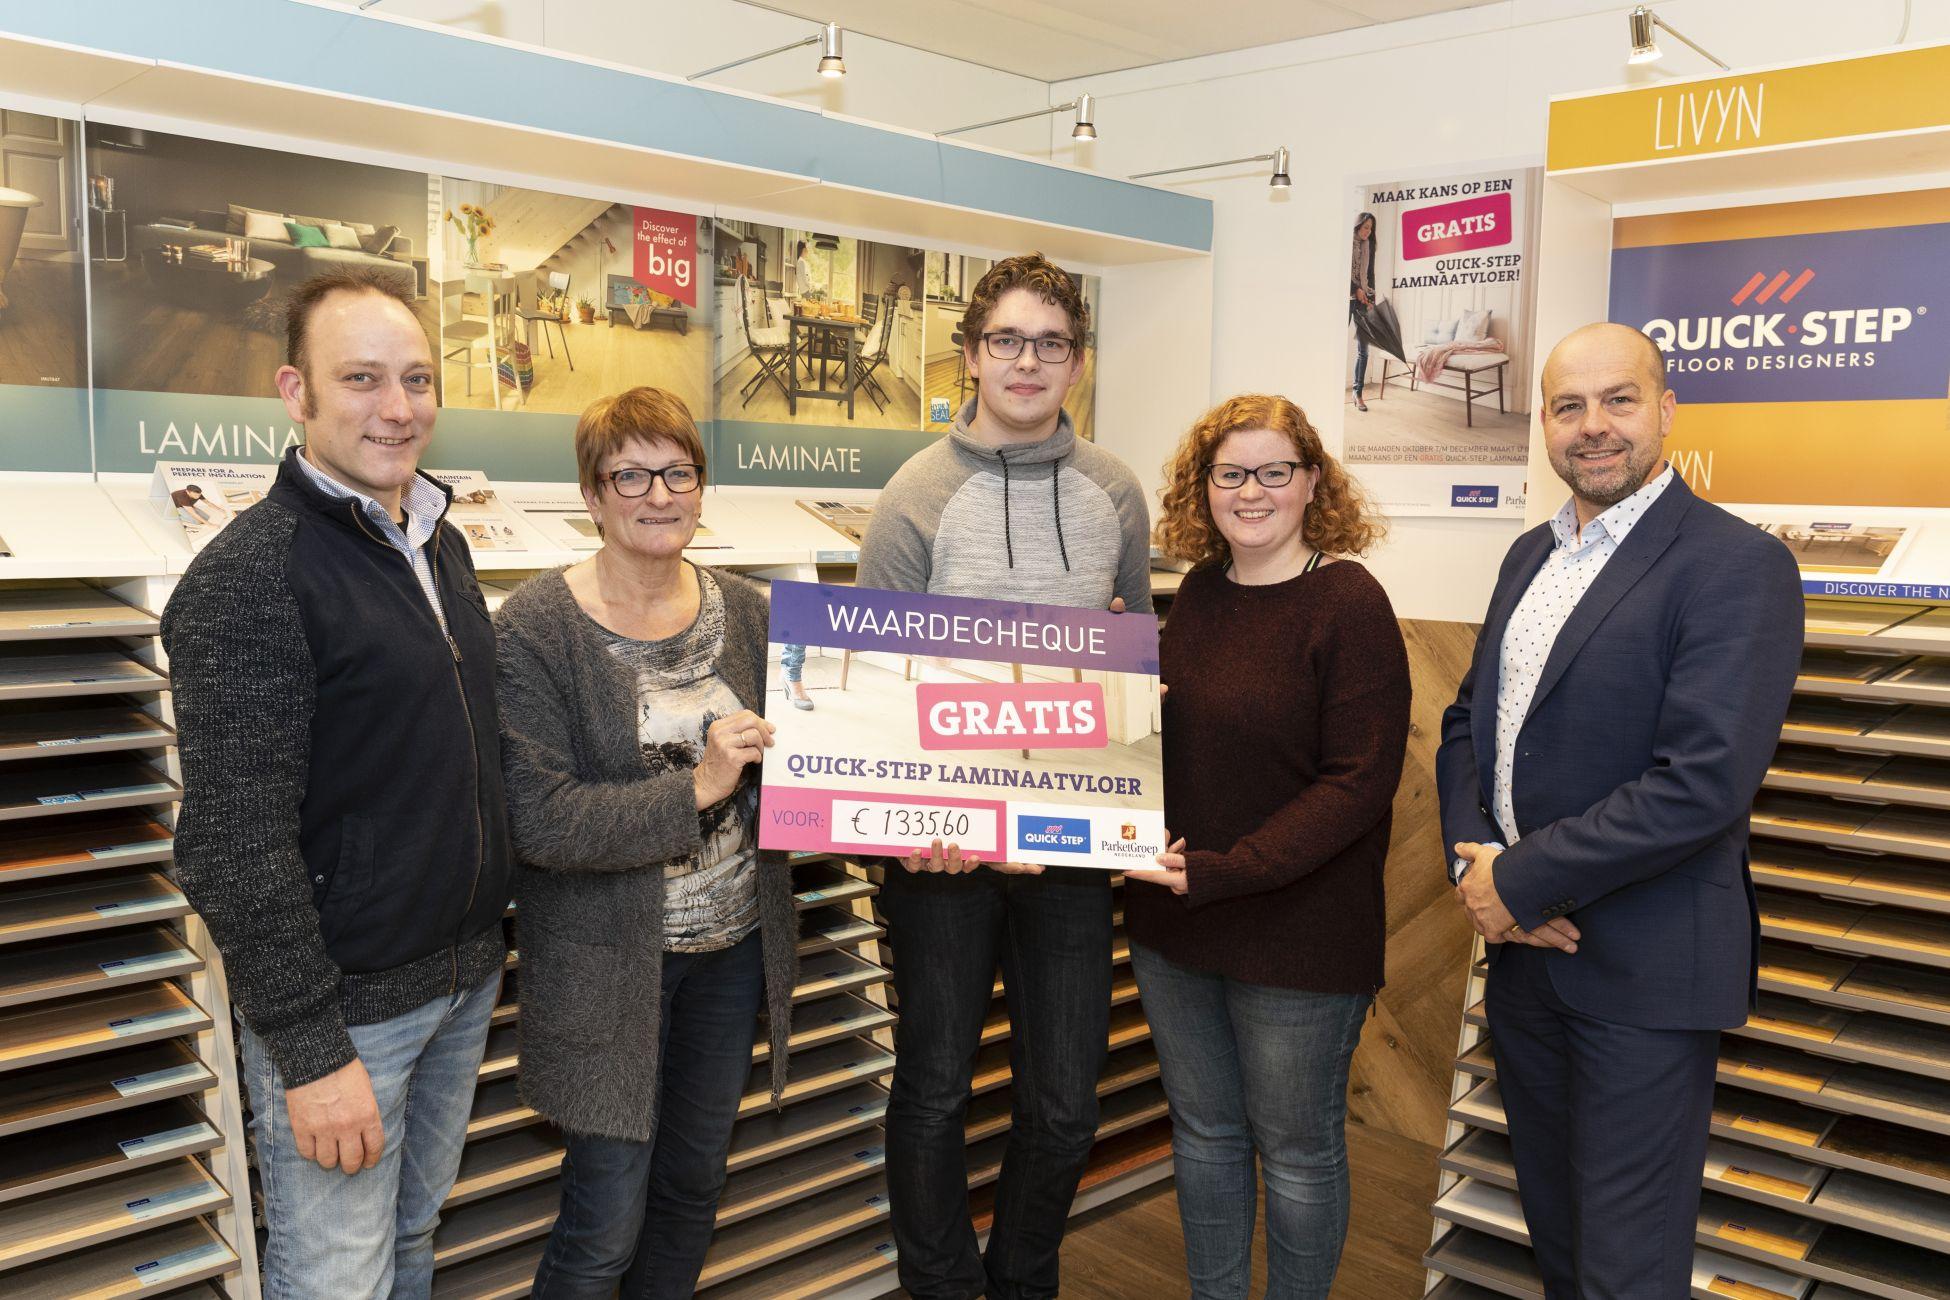 Zutphense familie Beerman wint laminaatvloer